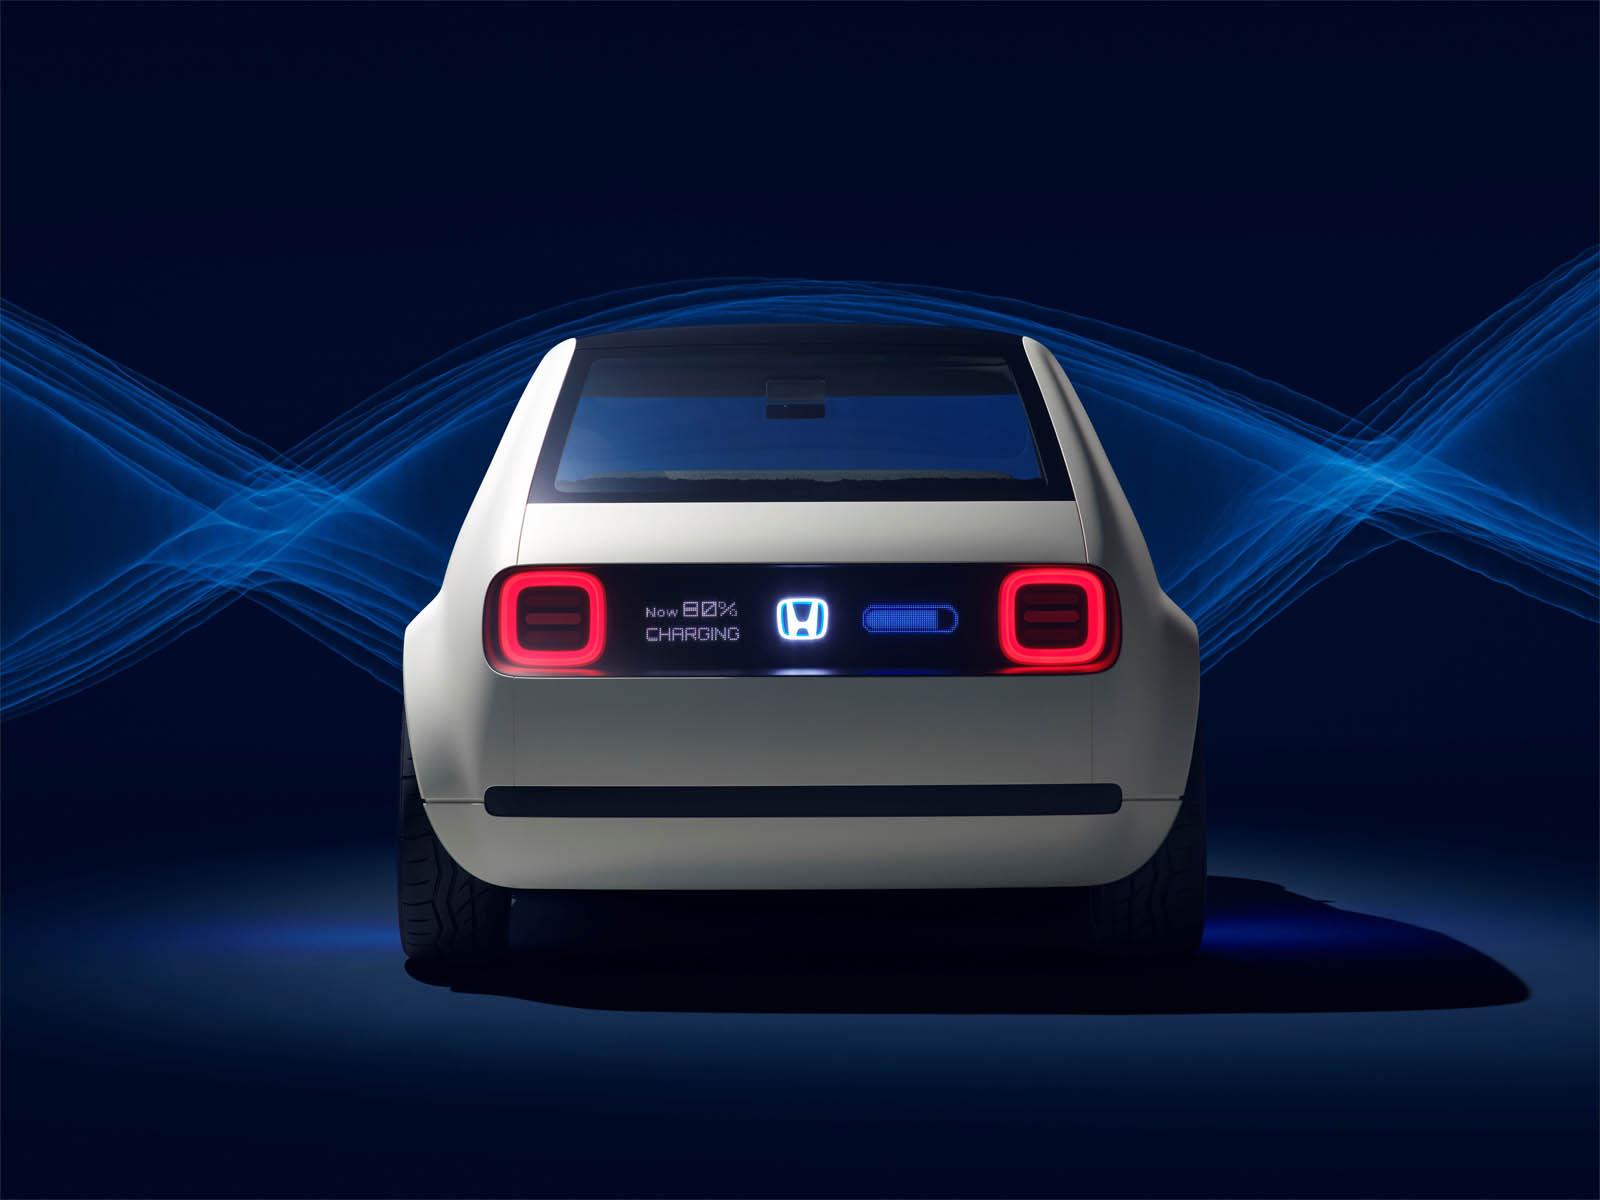 113874_Honda_Urban_EV_Concept_unveiled_at_the_Frankfurt_Motor_Show copy.jpg